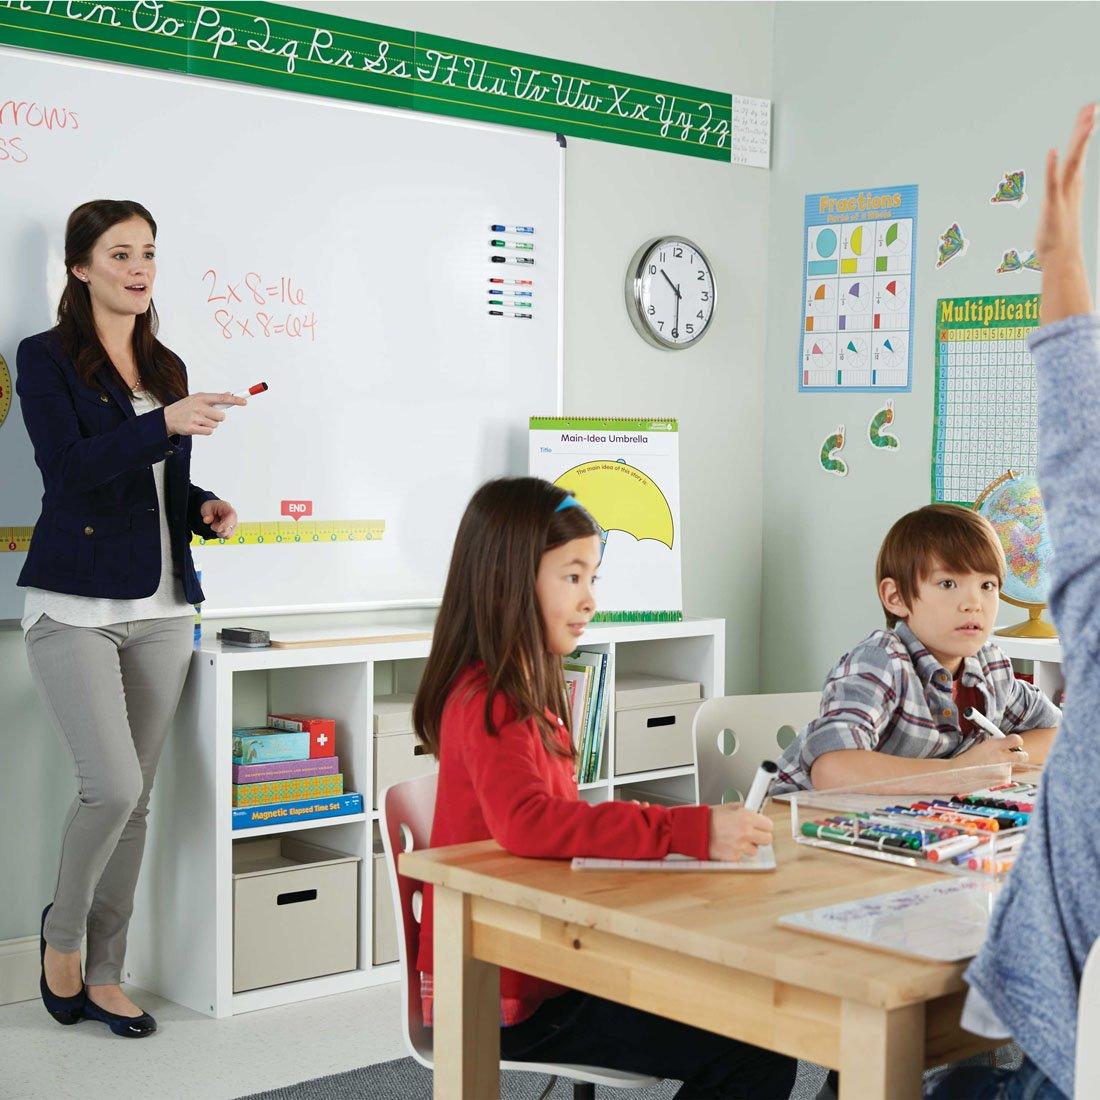 teacher-leading-classroom-standing-at-whiteboard.jpg